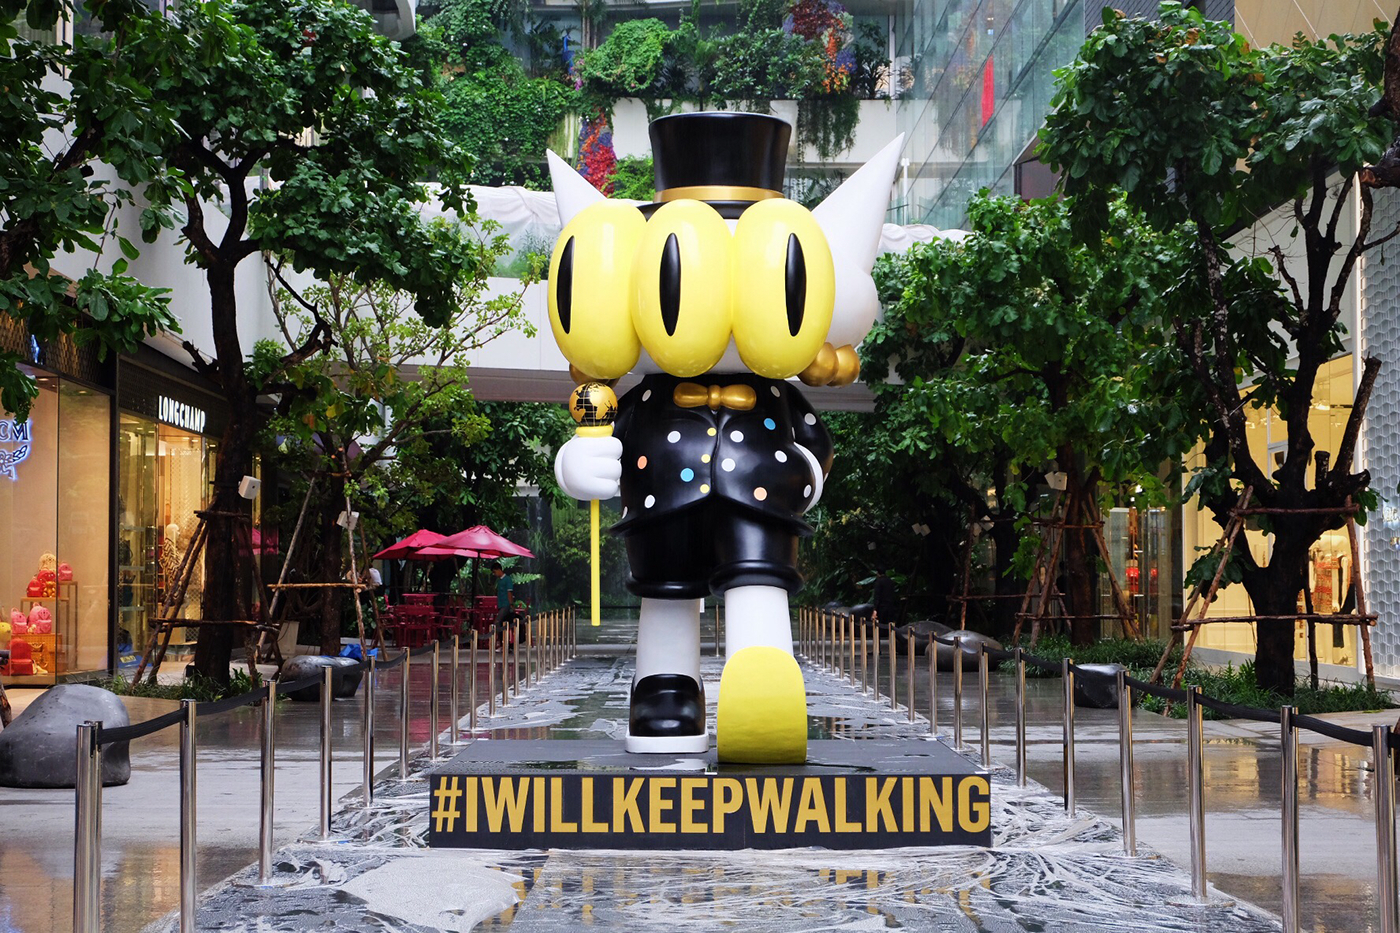 The Walking 3Balls